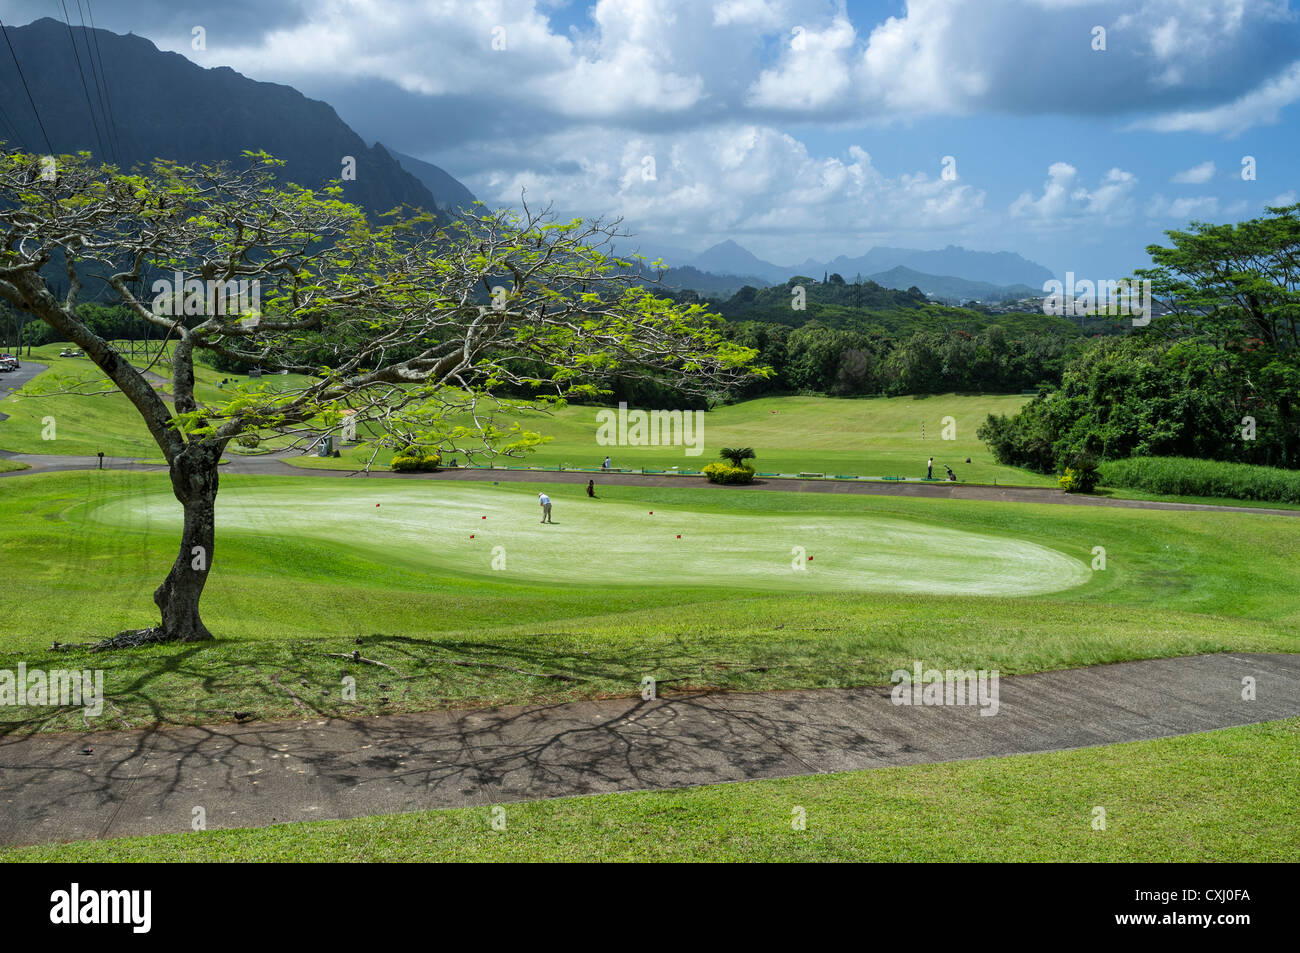 Practice putting green and driving range at Ko'olau Golf Club near Ko'olau Range in Kaneohe, Hawaii. - Stock Image